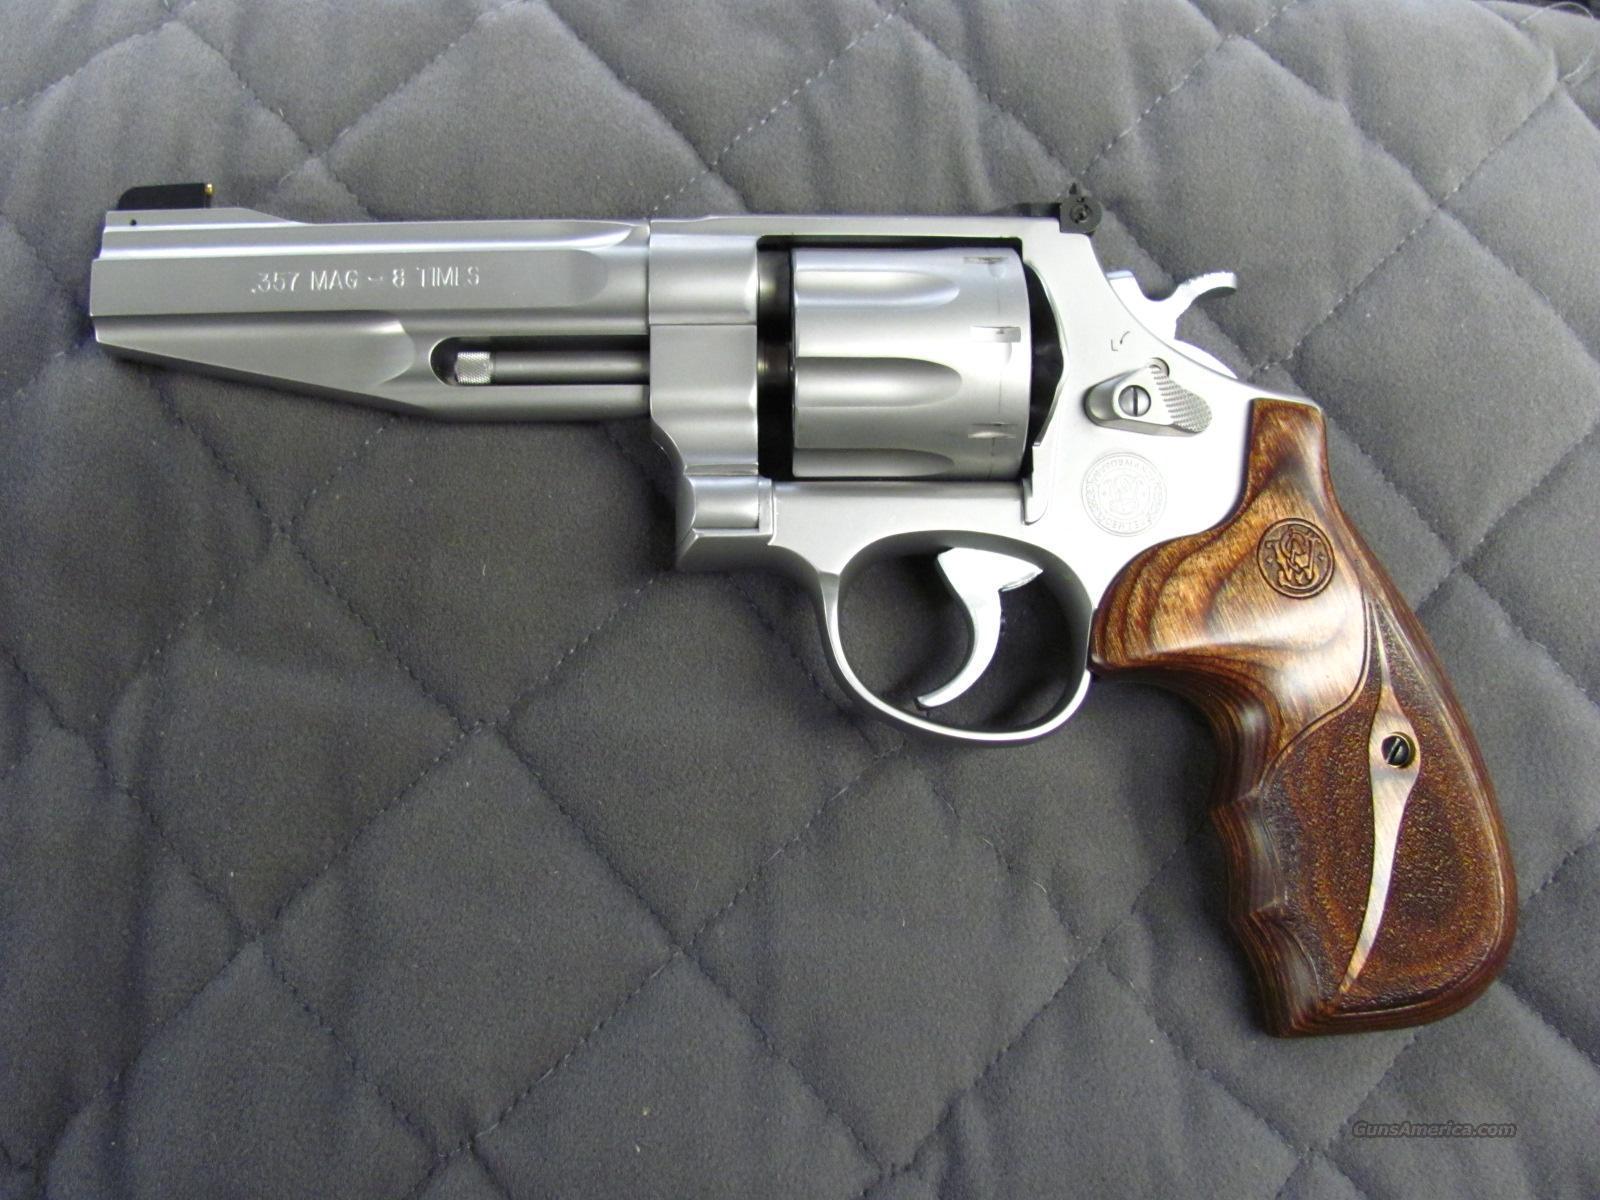 Smith & Wesson Model 627 Performance Center 5 Inch 357 mag  **NEW**  Guns > Pistols > Smith & Wesson Revolvers > Full Frame Revolver